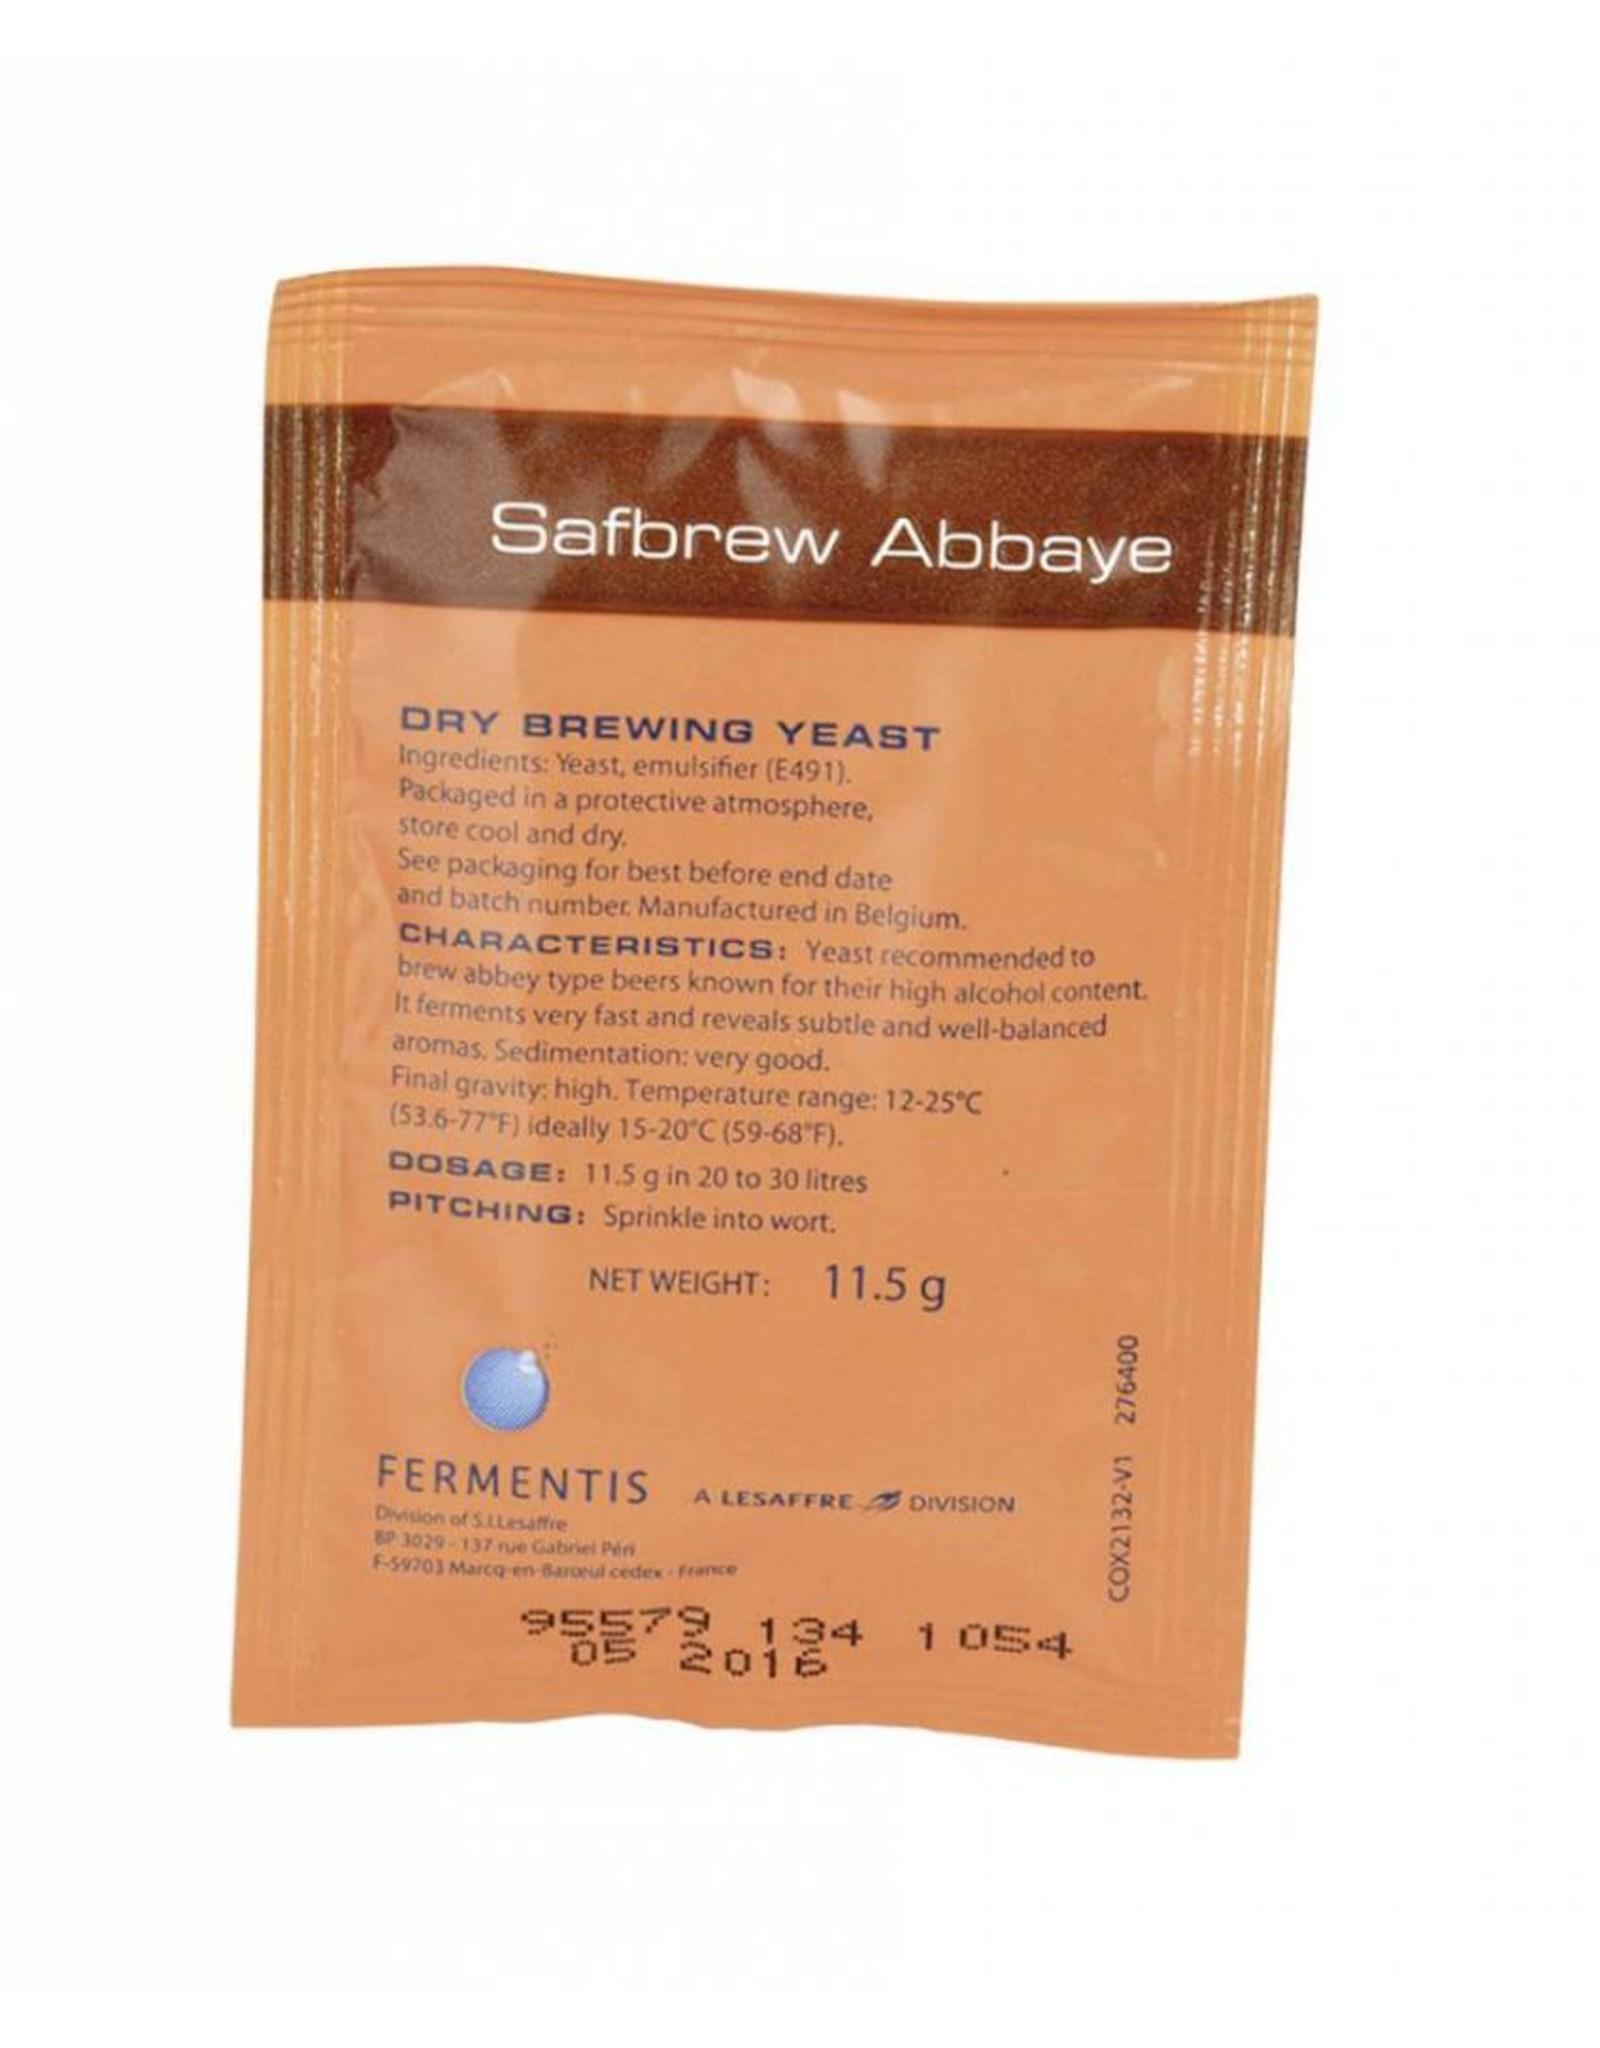 Safbrew BE-256 (Abbaye) Brewing Yeast